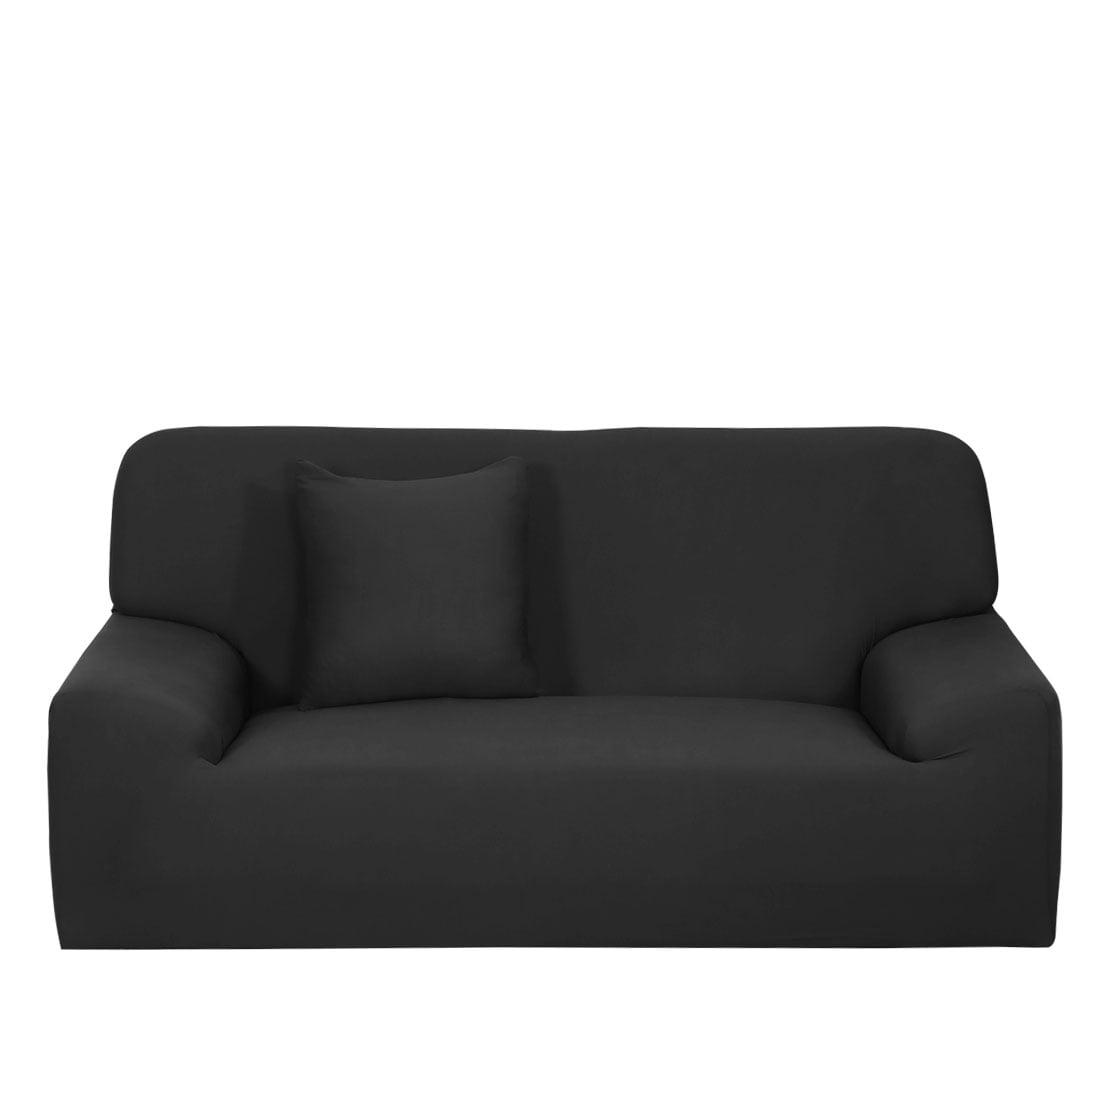 Unique Bargains Stretch Sofa Slipcover, Multiple Colors, Multiple Sizes (Chair, Loveseat, Sofa)